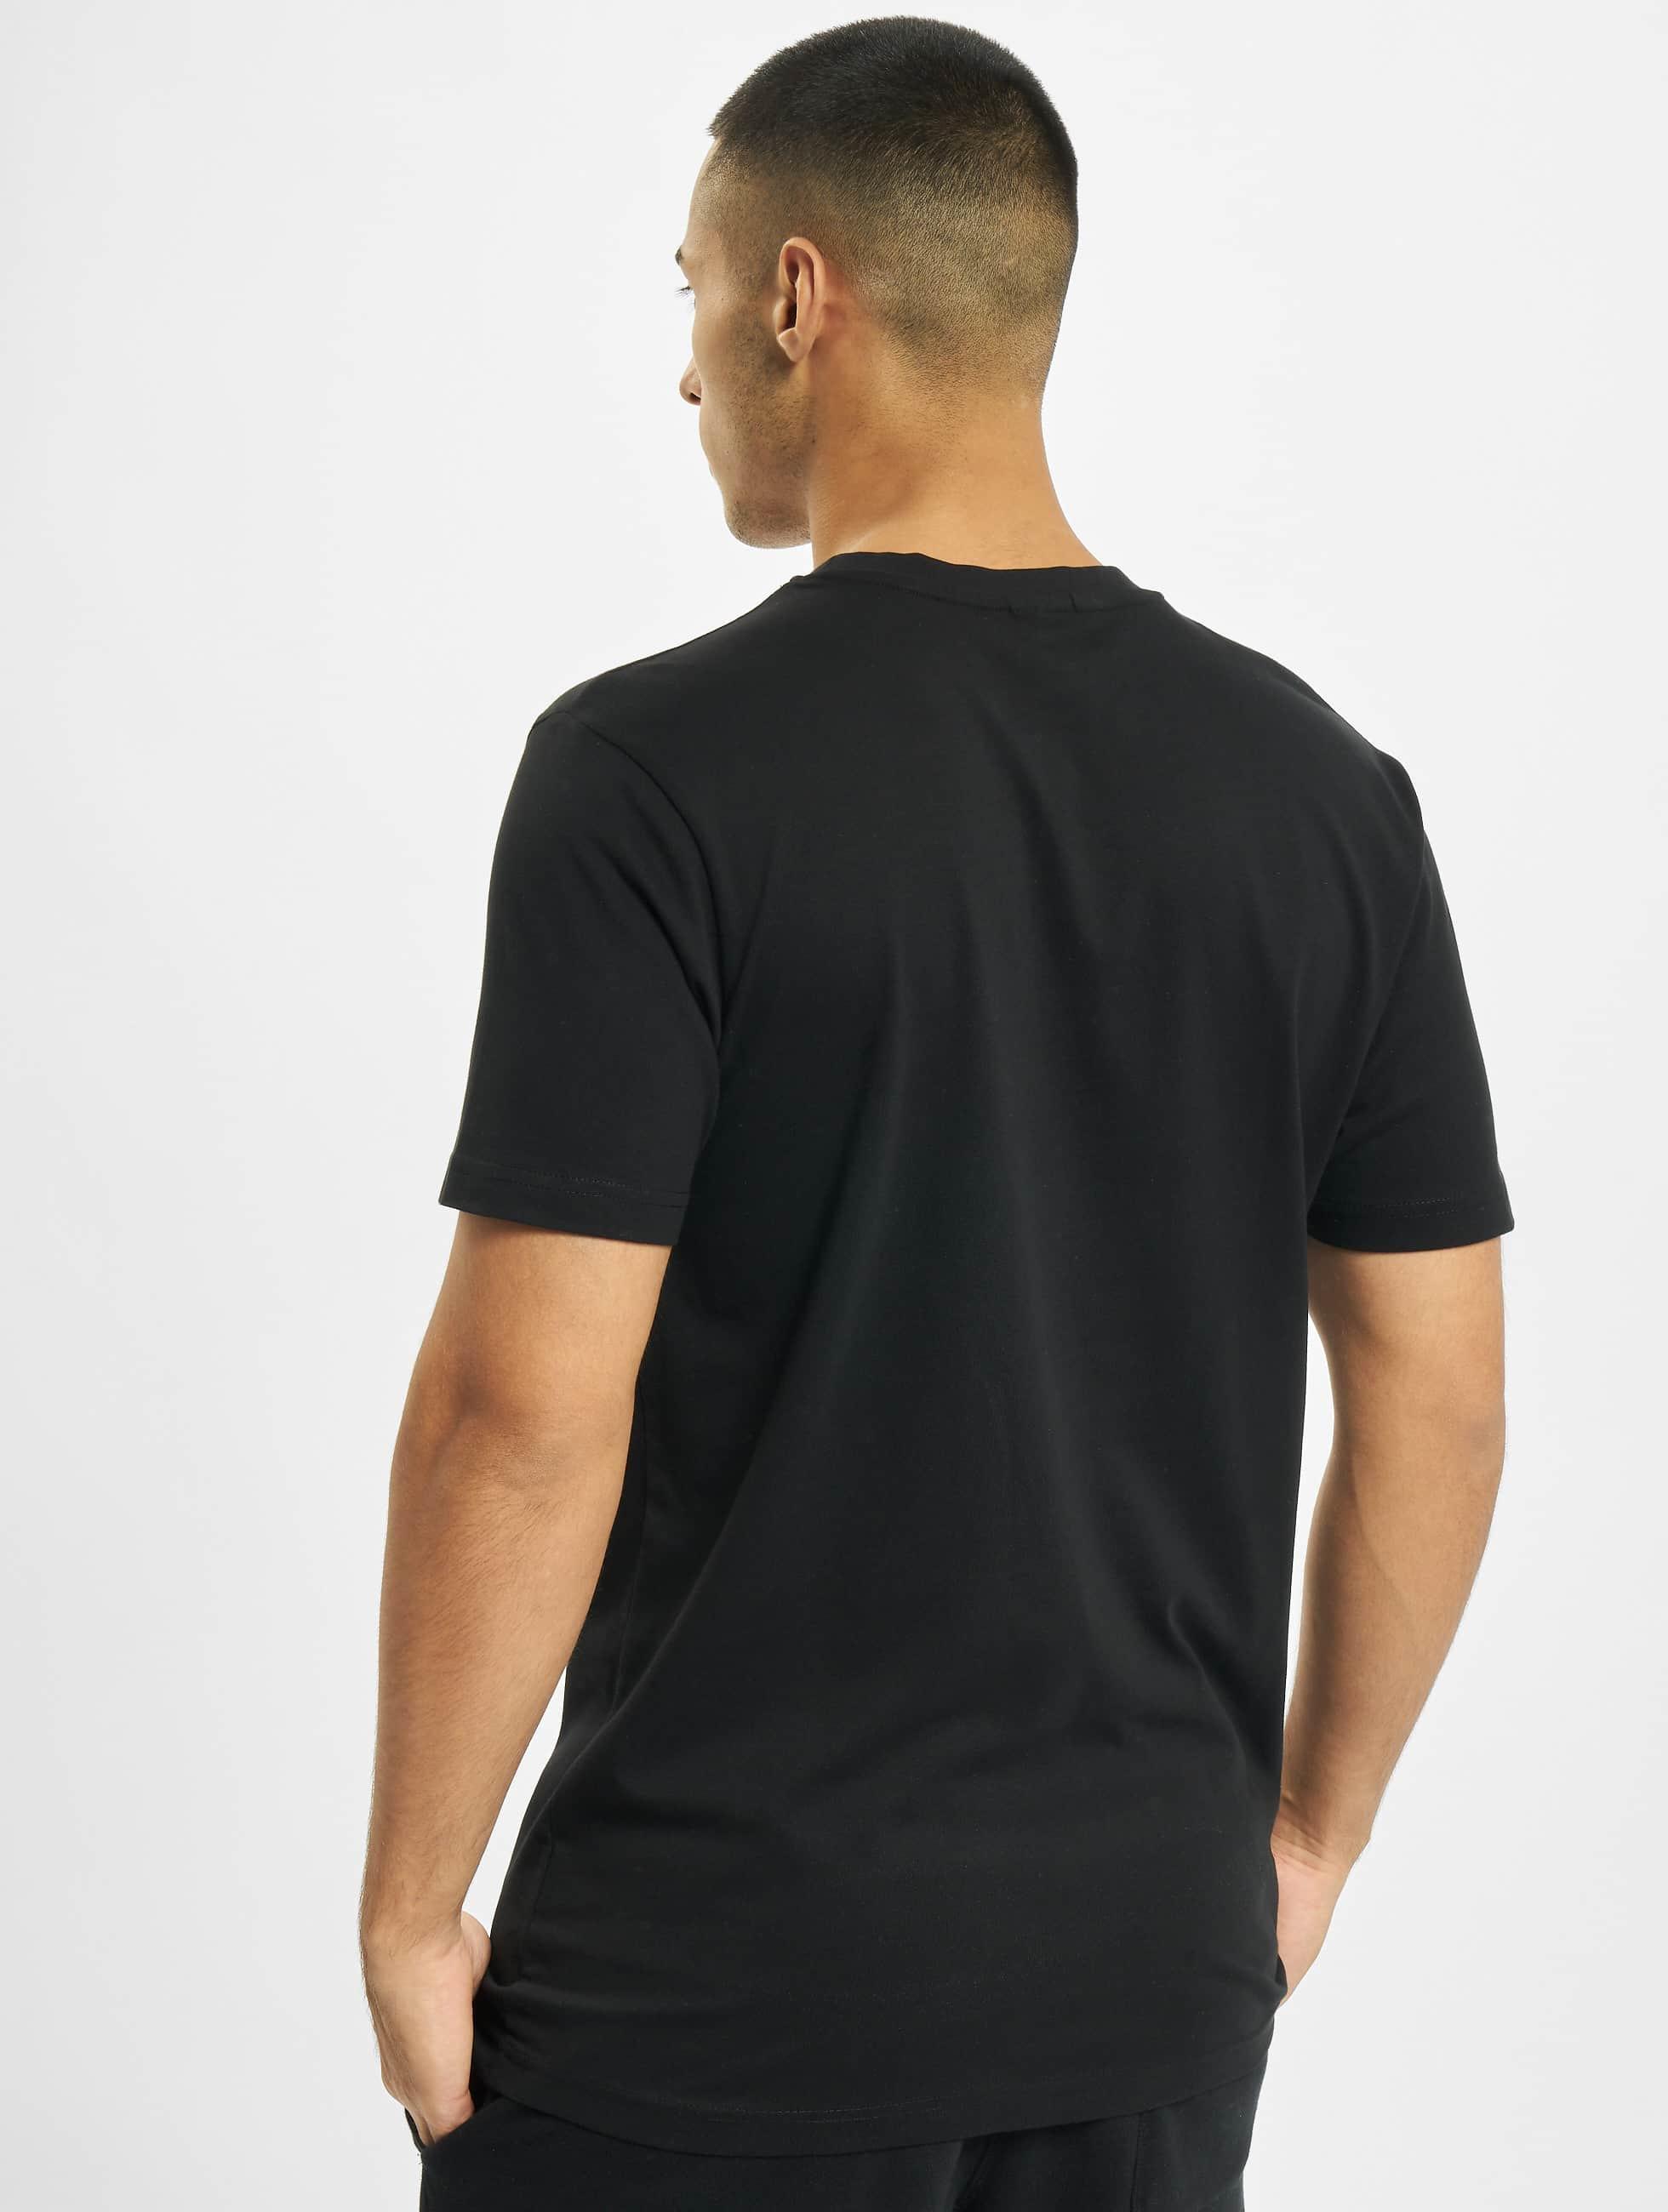 Merchcode T-shirts Joy Division Up sort